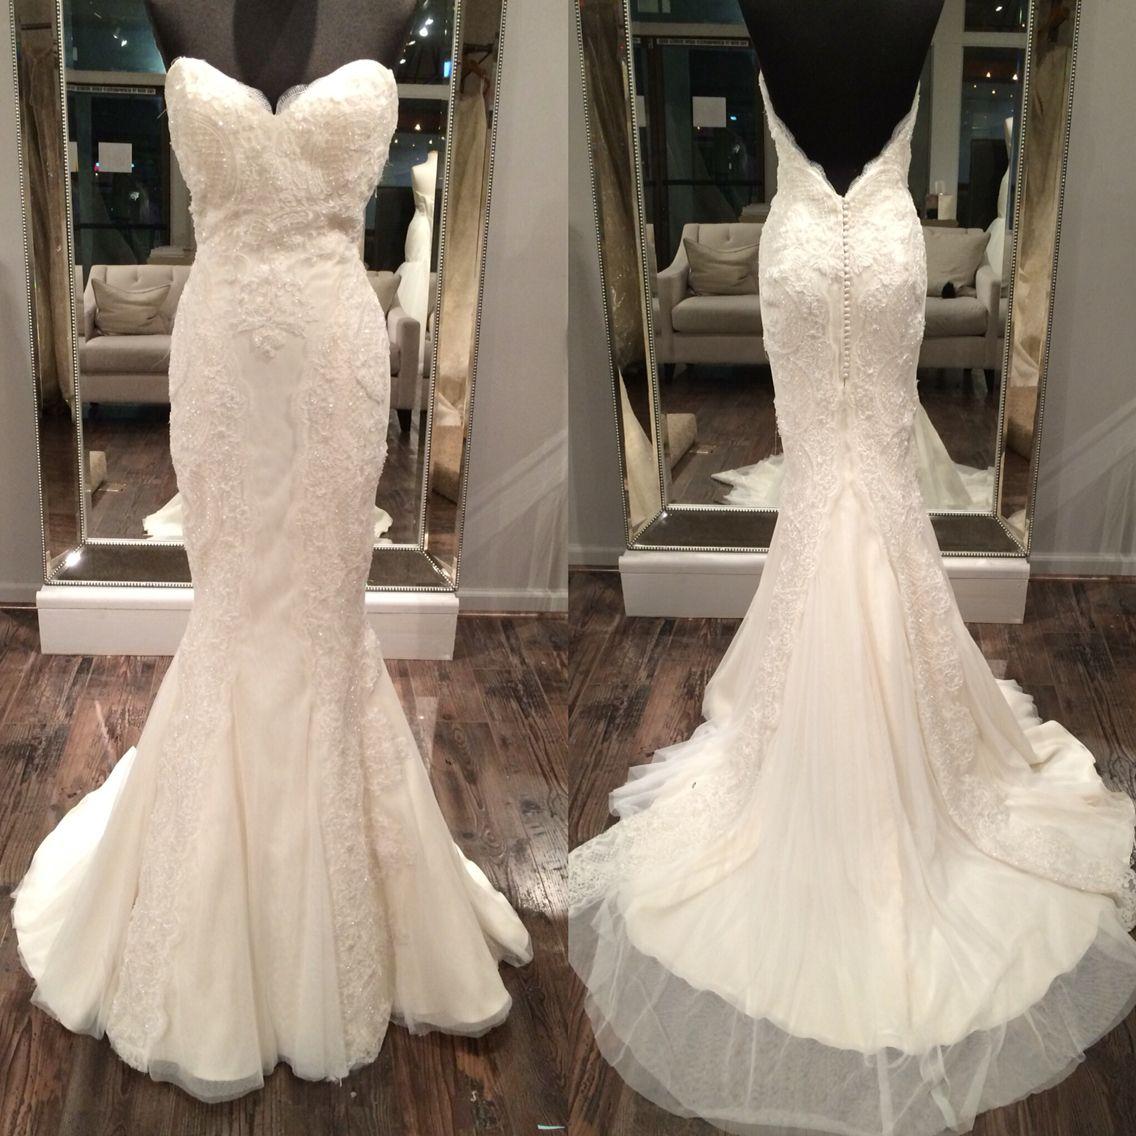 Marisa wedding dress  Marisa Bridals Trunk Show this weekend at our Del Mar location